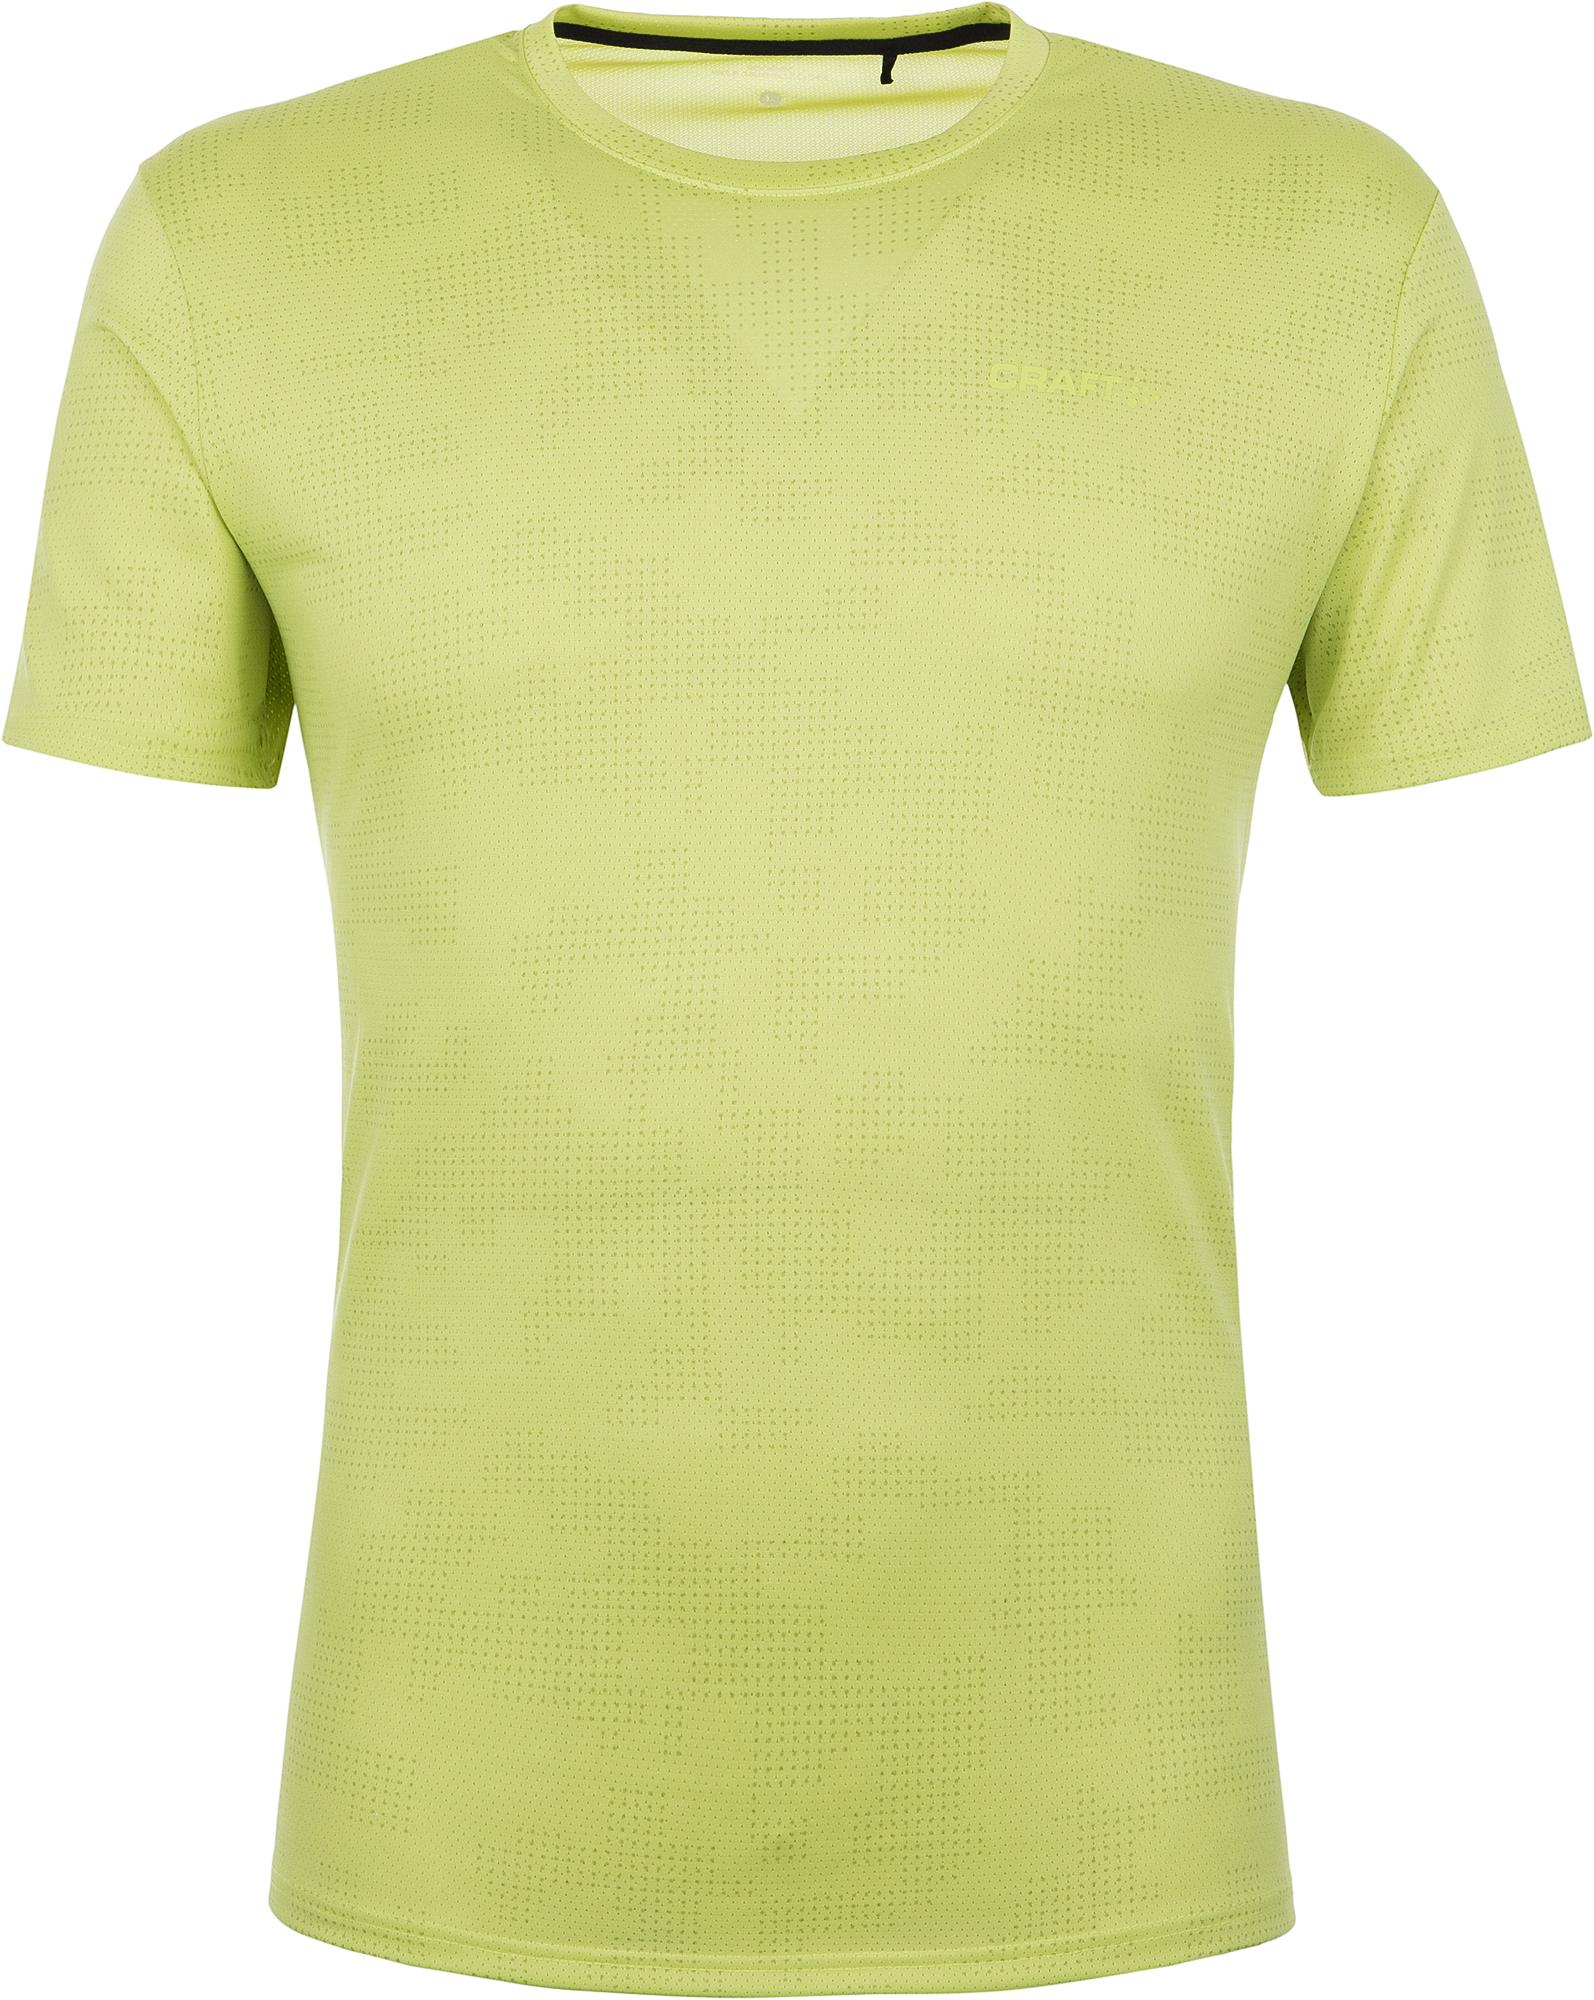 Craft Футболка мужская Craft Eaze, размер 46-48 цена 2017